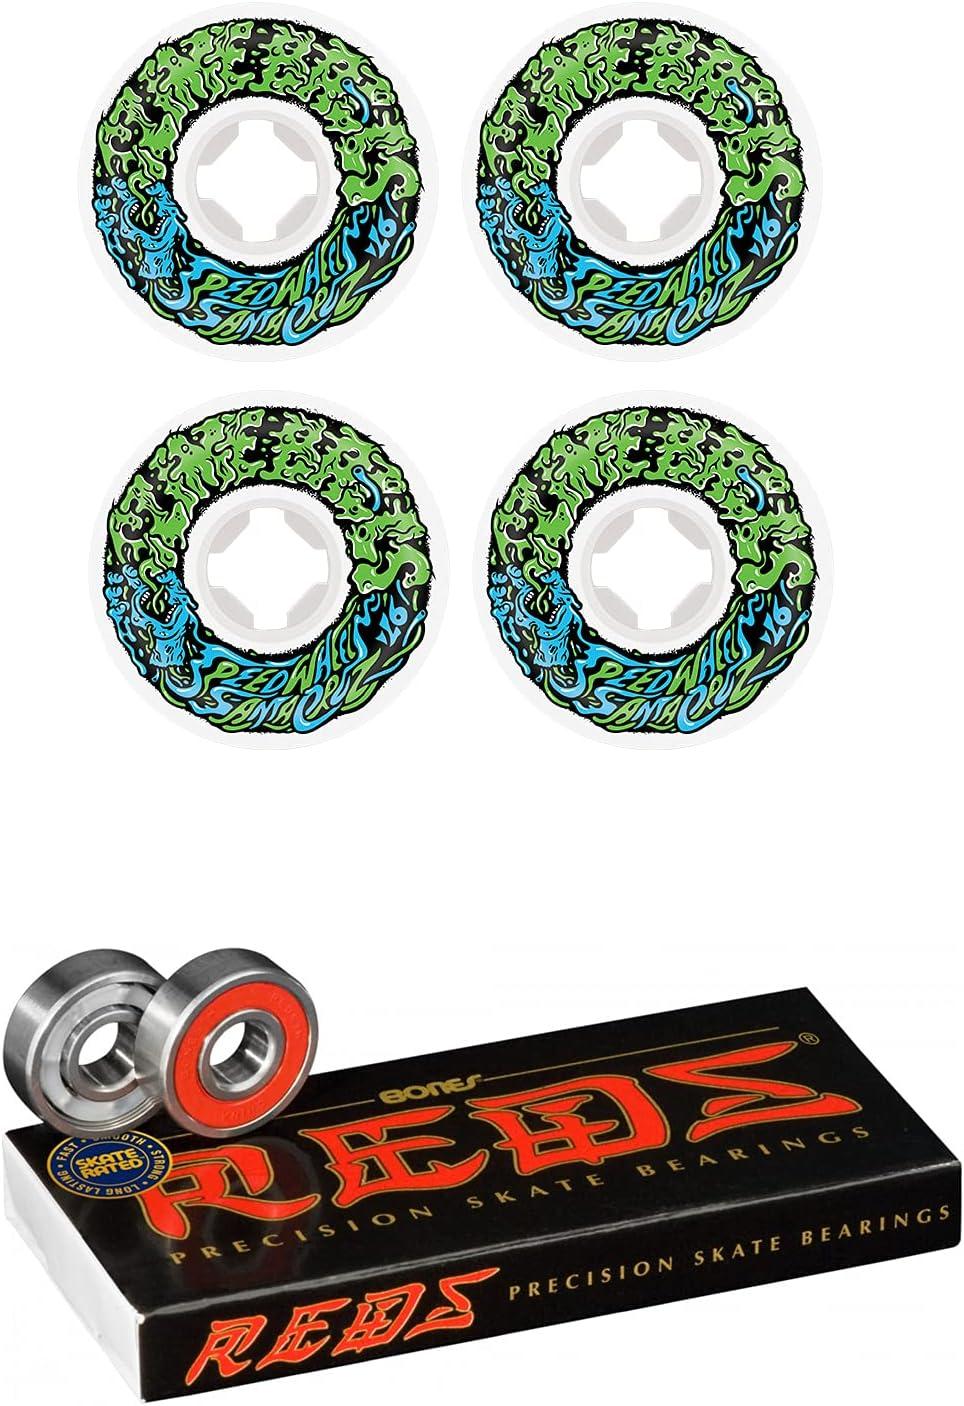 Slime Max 50% OFF Deluxe Balls Skateboard Wheels 54mm Vomit White Bo Mini 97A Green